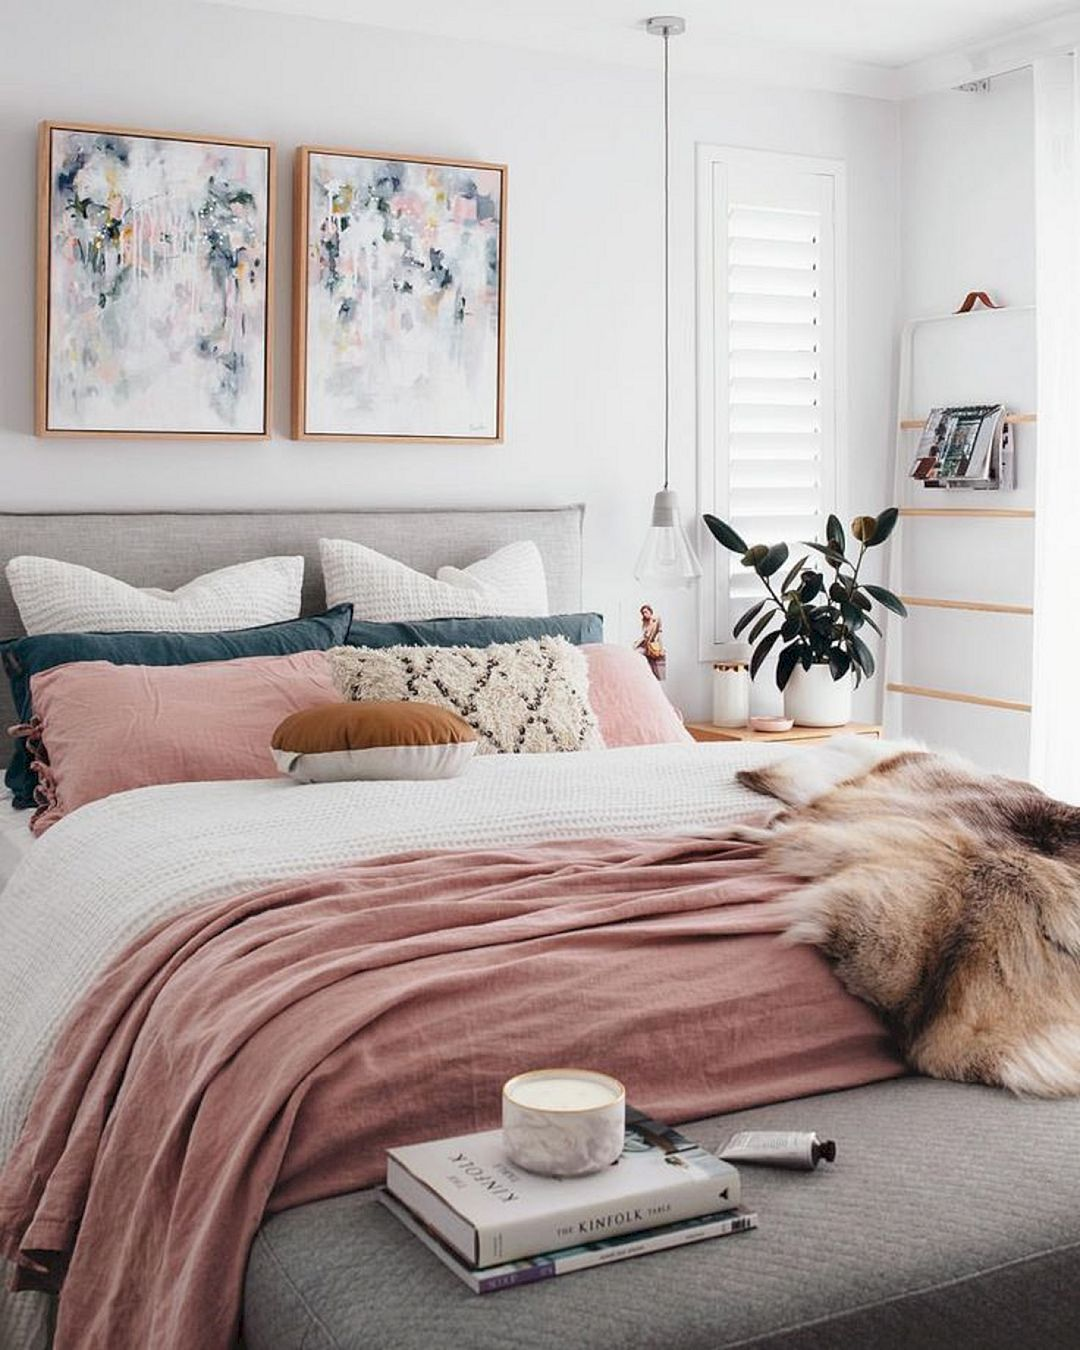 Breathtaking 85 Marvelous Minimalist Modern Master Bedroom Design